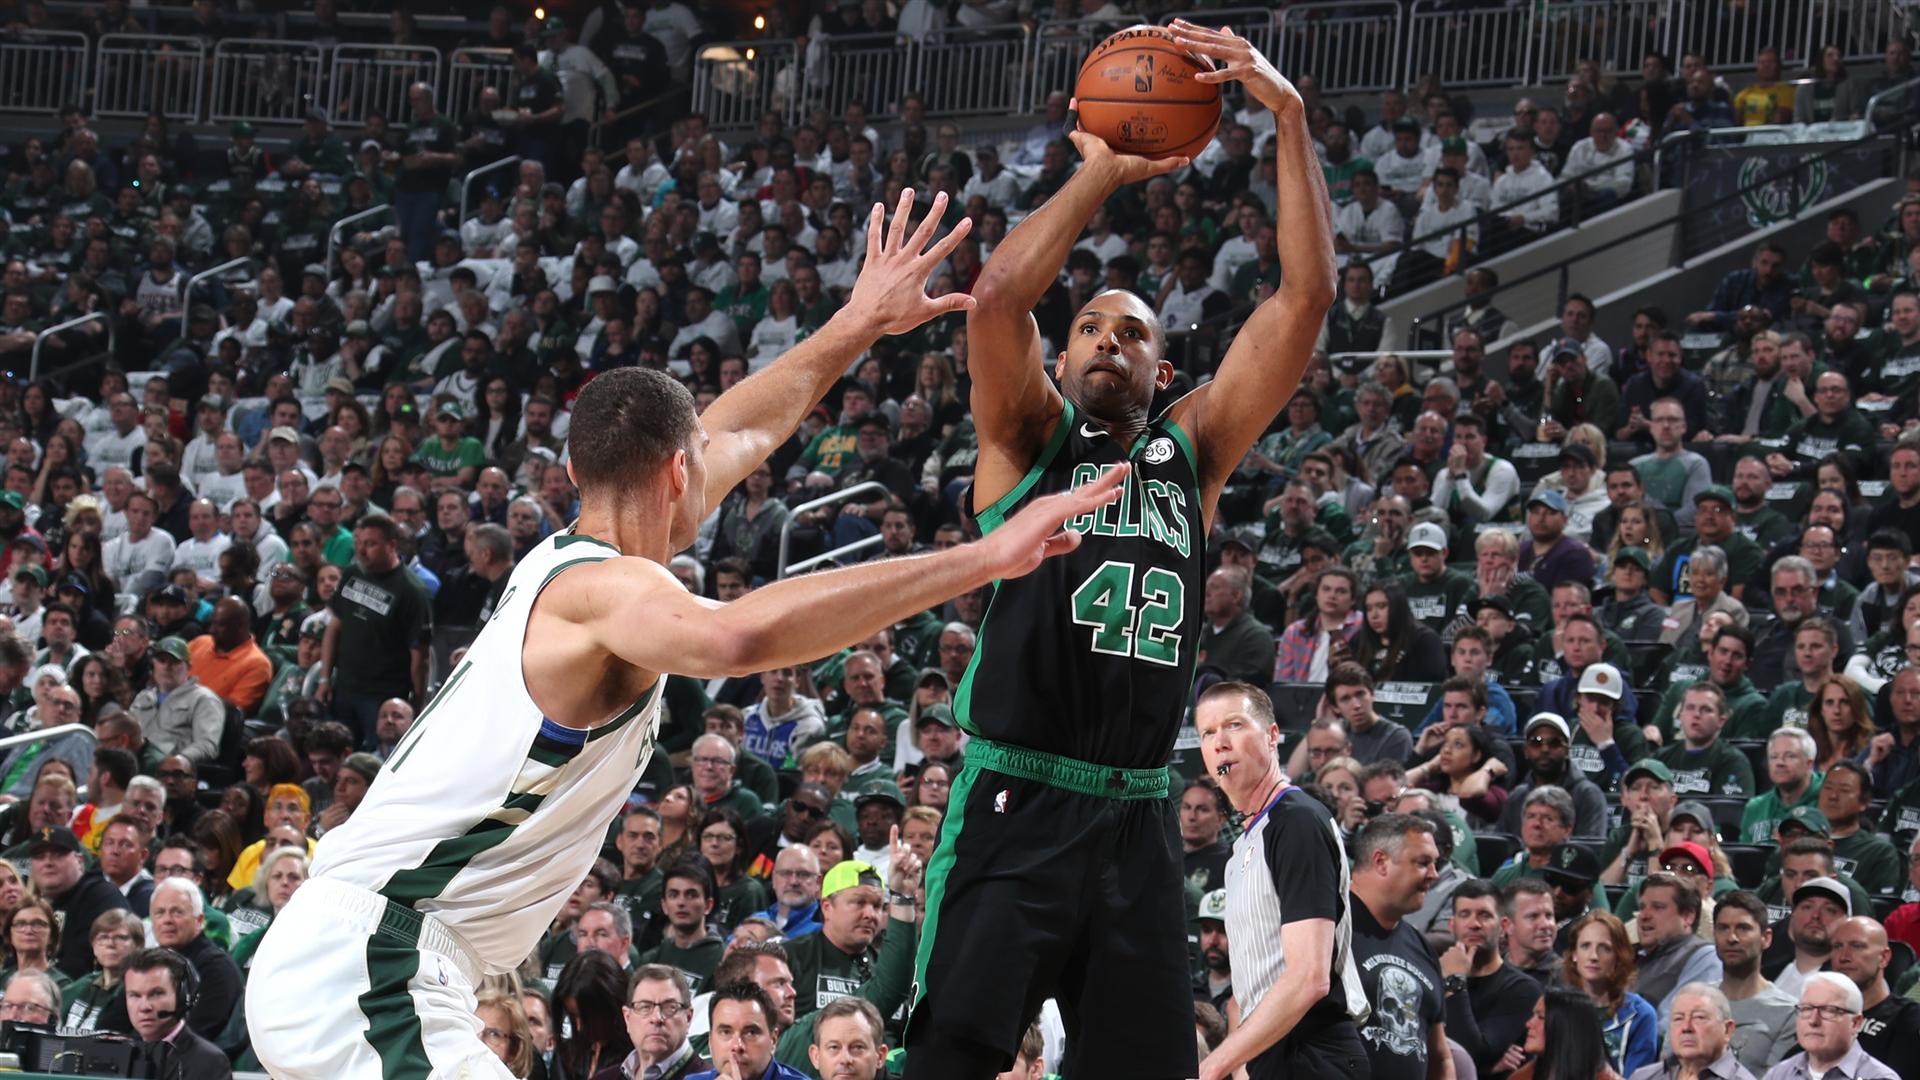 NBA Playoffs 2019: Boston Celtics' Al Horford Earns Player